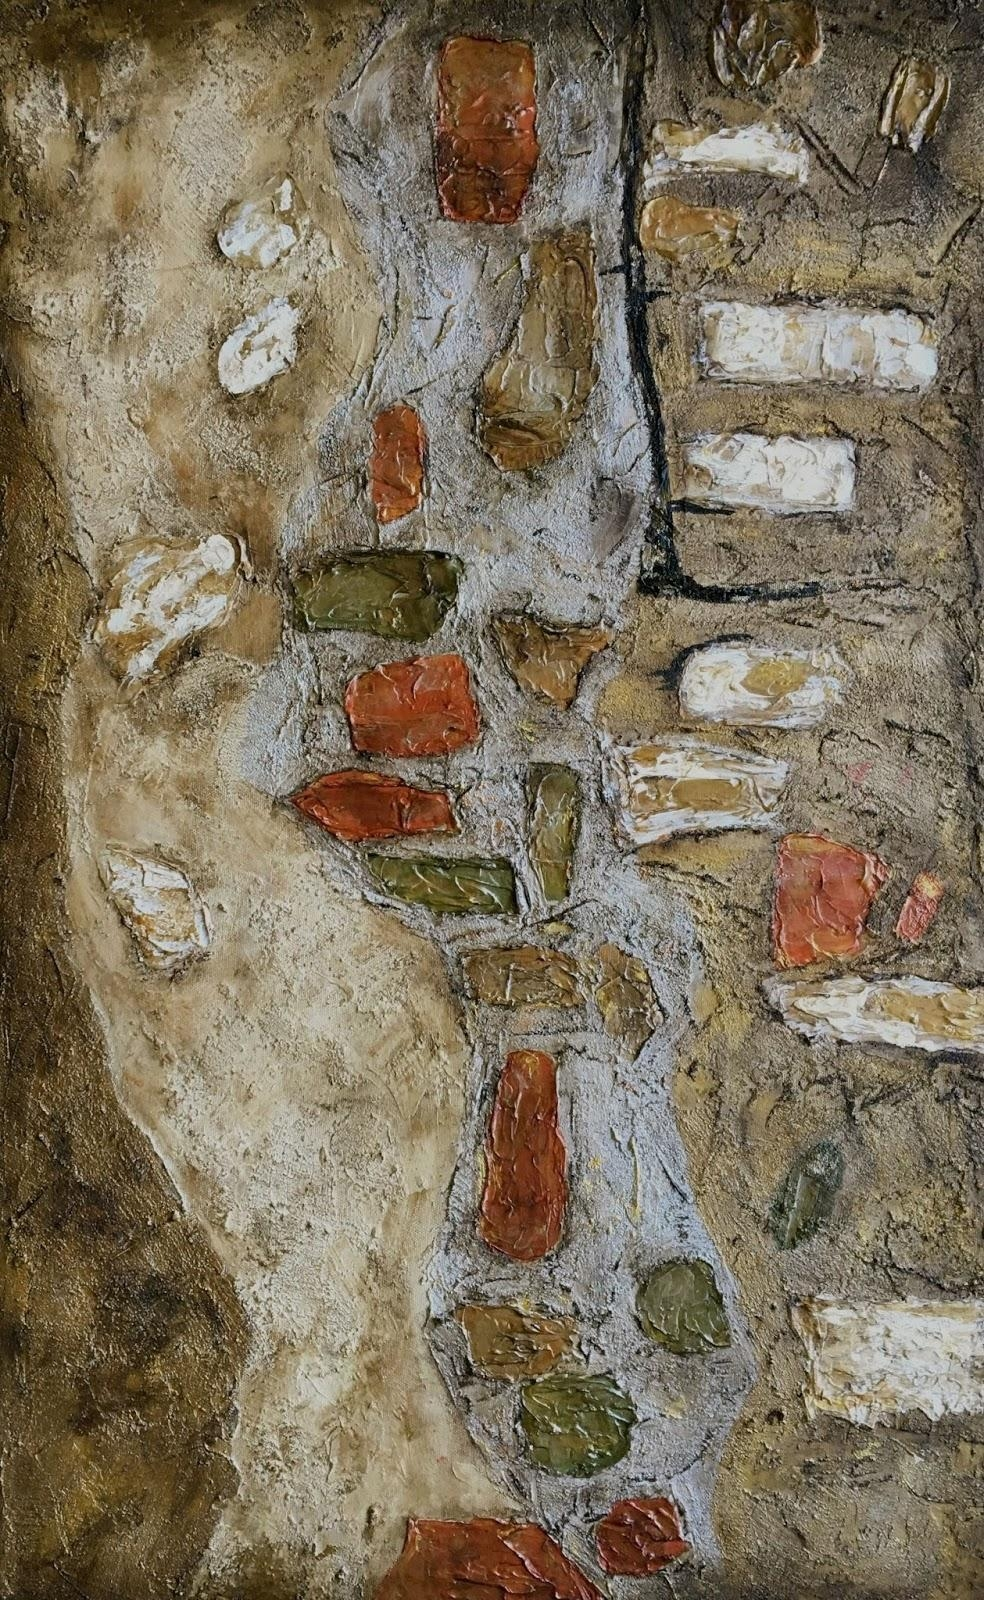 Daily Painters Abstract Gallery: Italian Architecture, Mixed Media Inside Italian Stone Wall Art (Image 10 of 20)